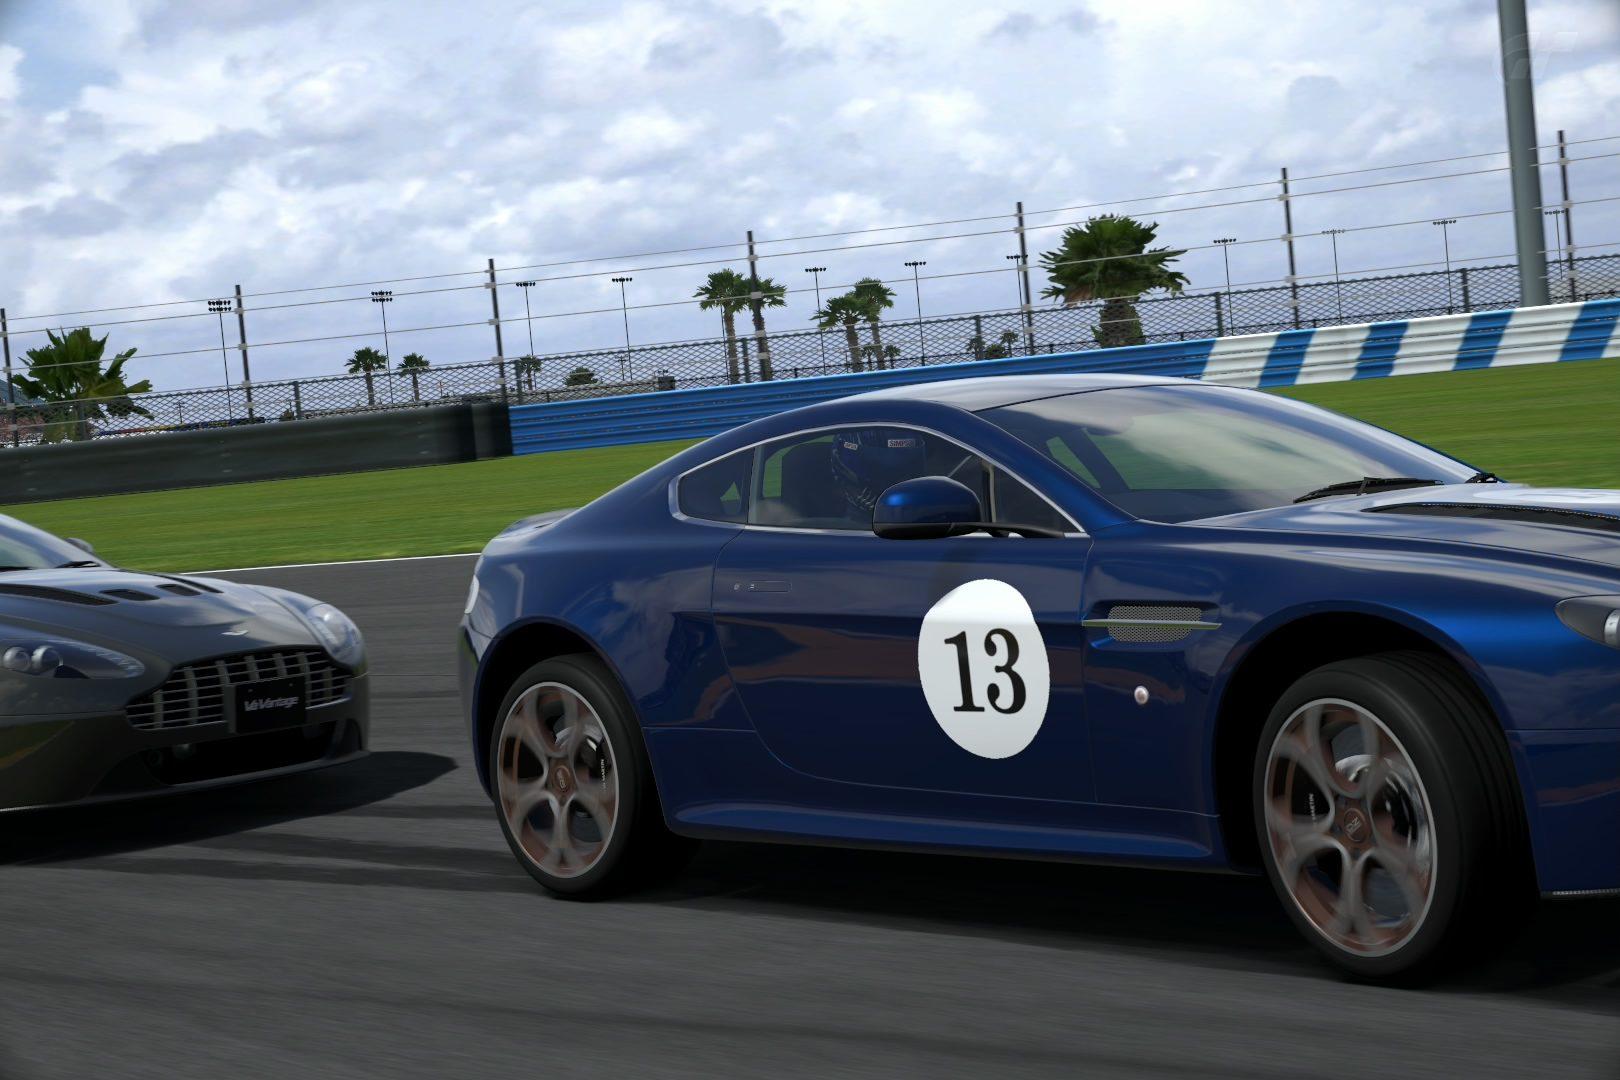 Daytona Road Course_17.jpg